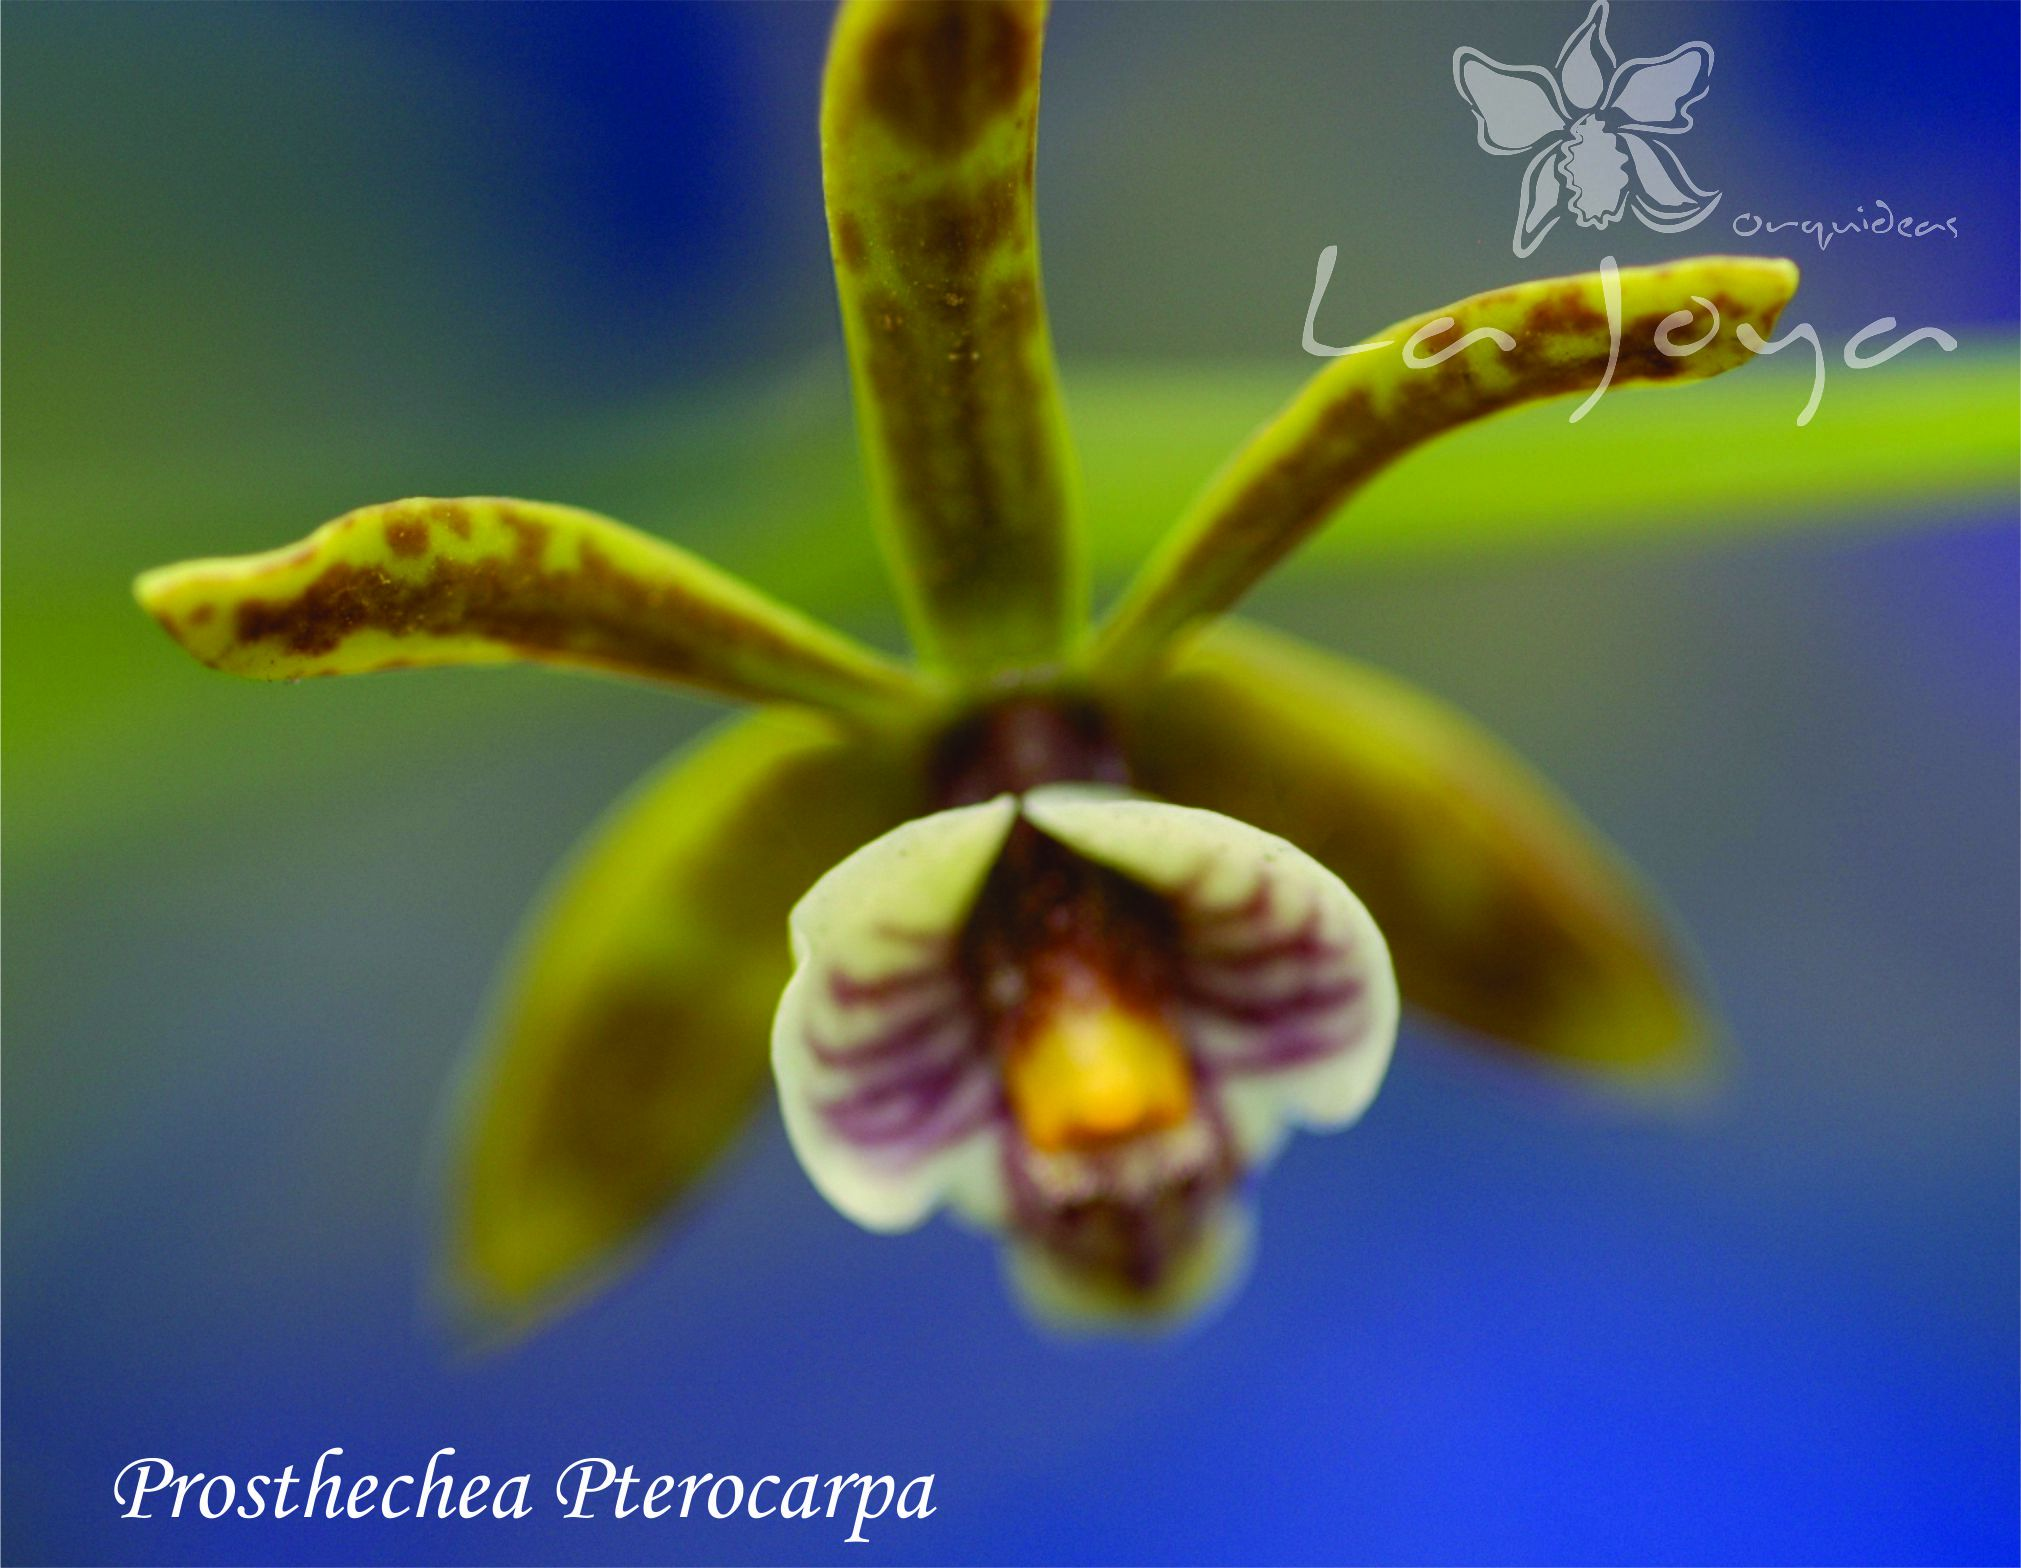 Prostechea Pterocarpa